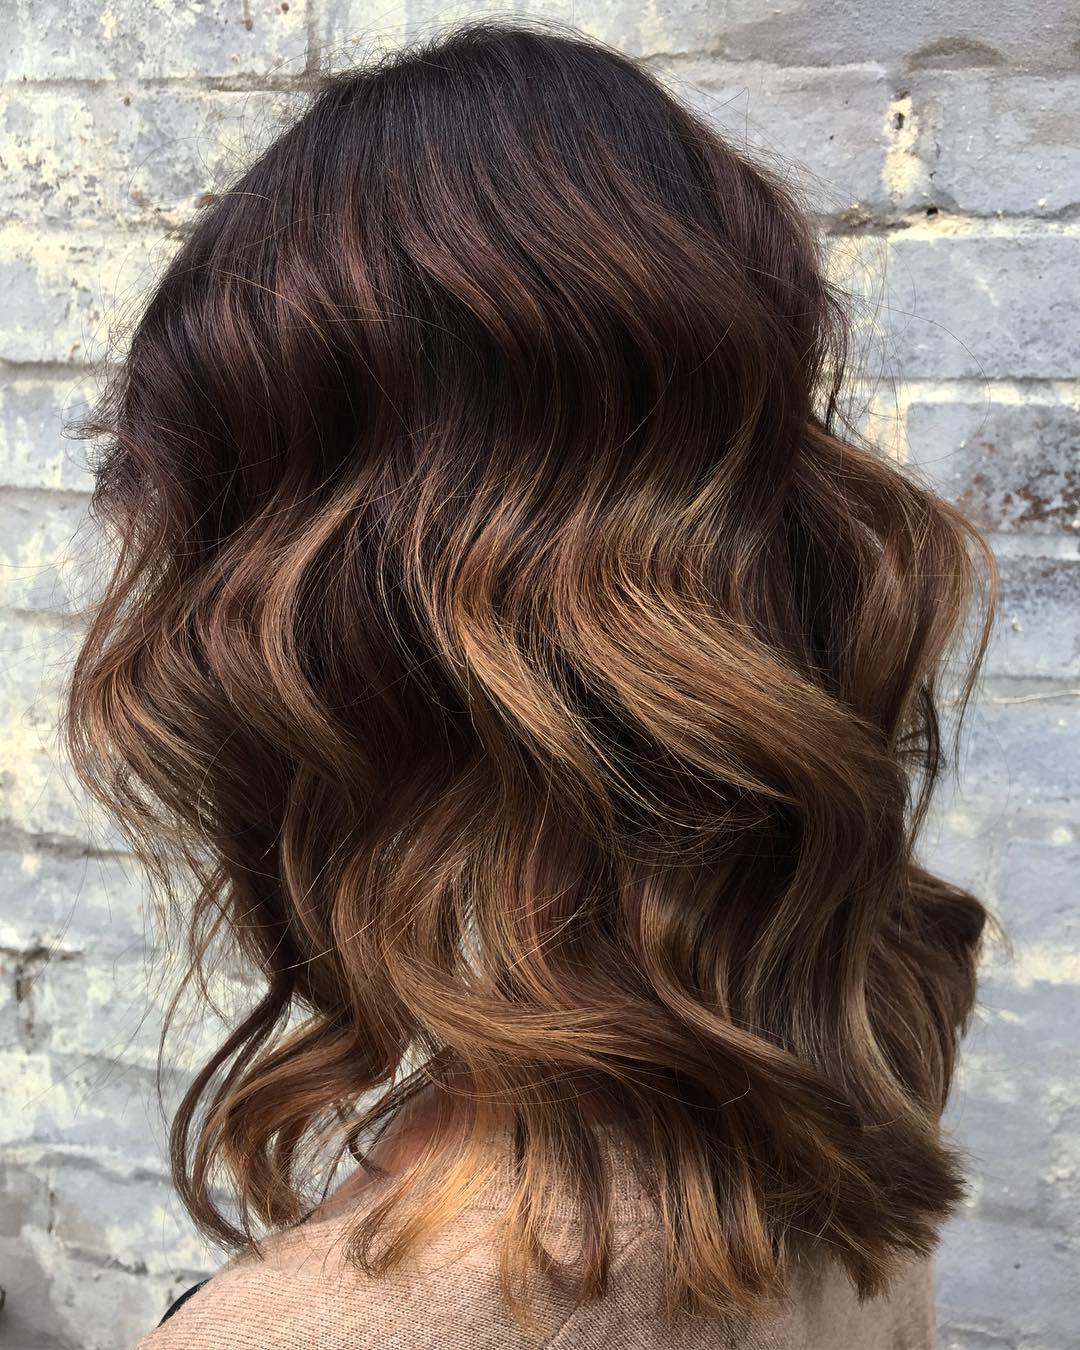 Chocolate Hair with Caramel Peekaboo Highlights